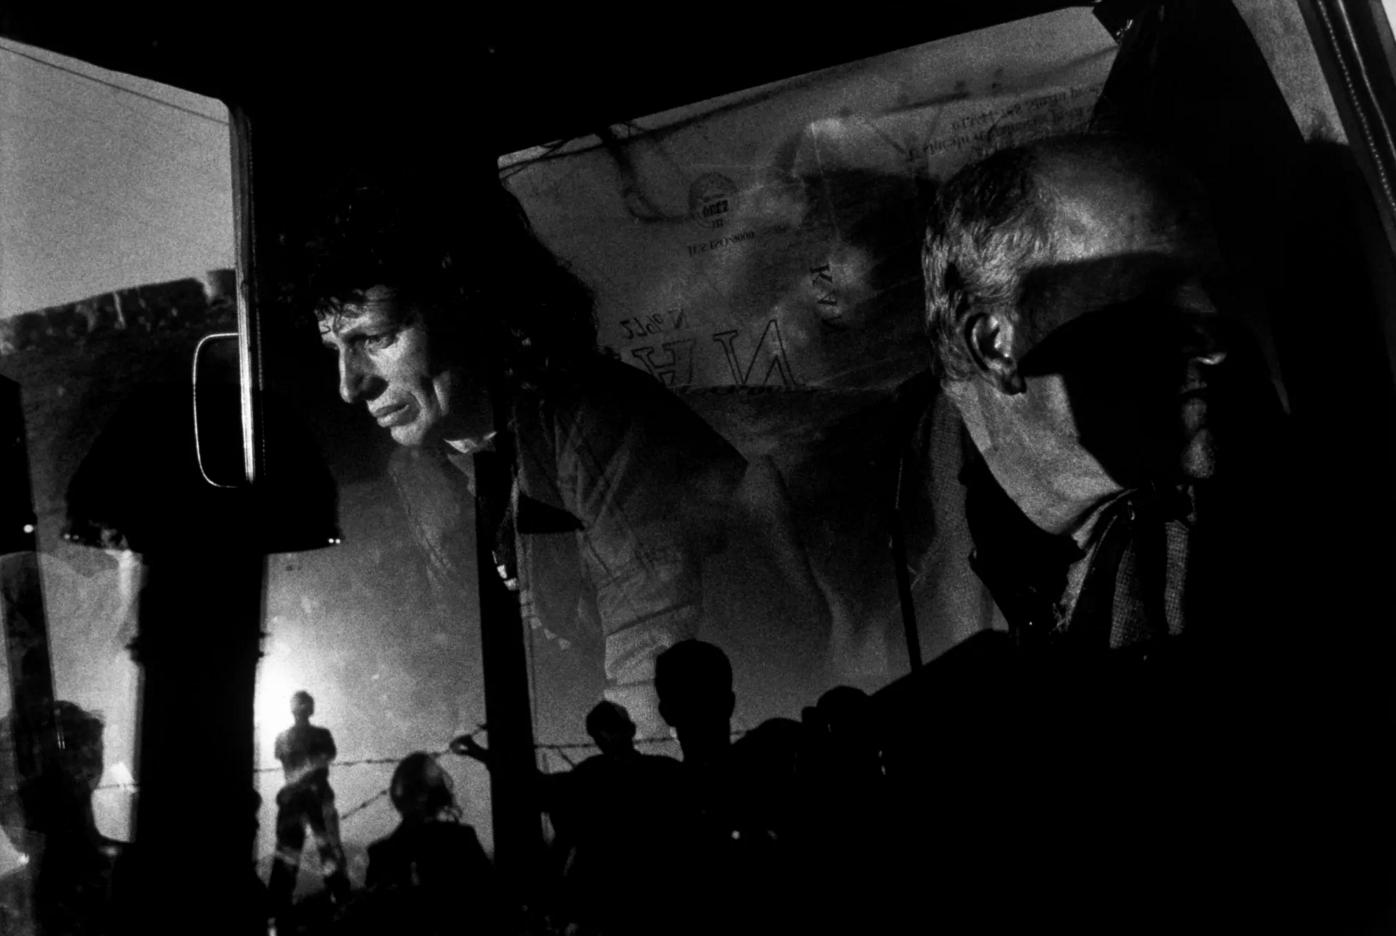 Photo by Paolo Pellegrin/Magnum Photos